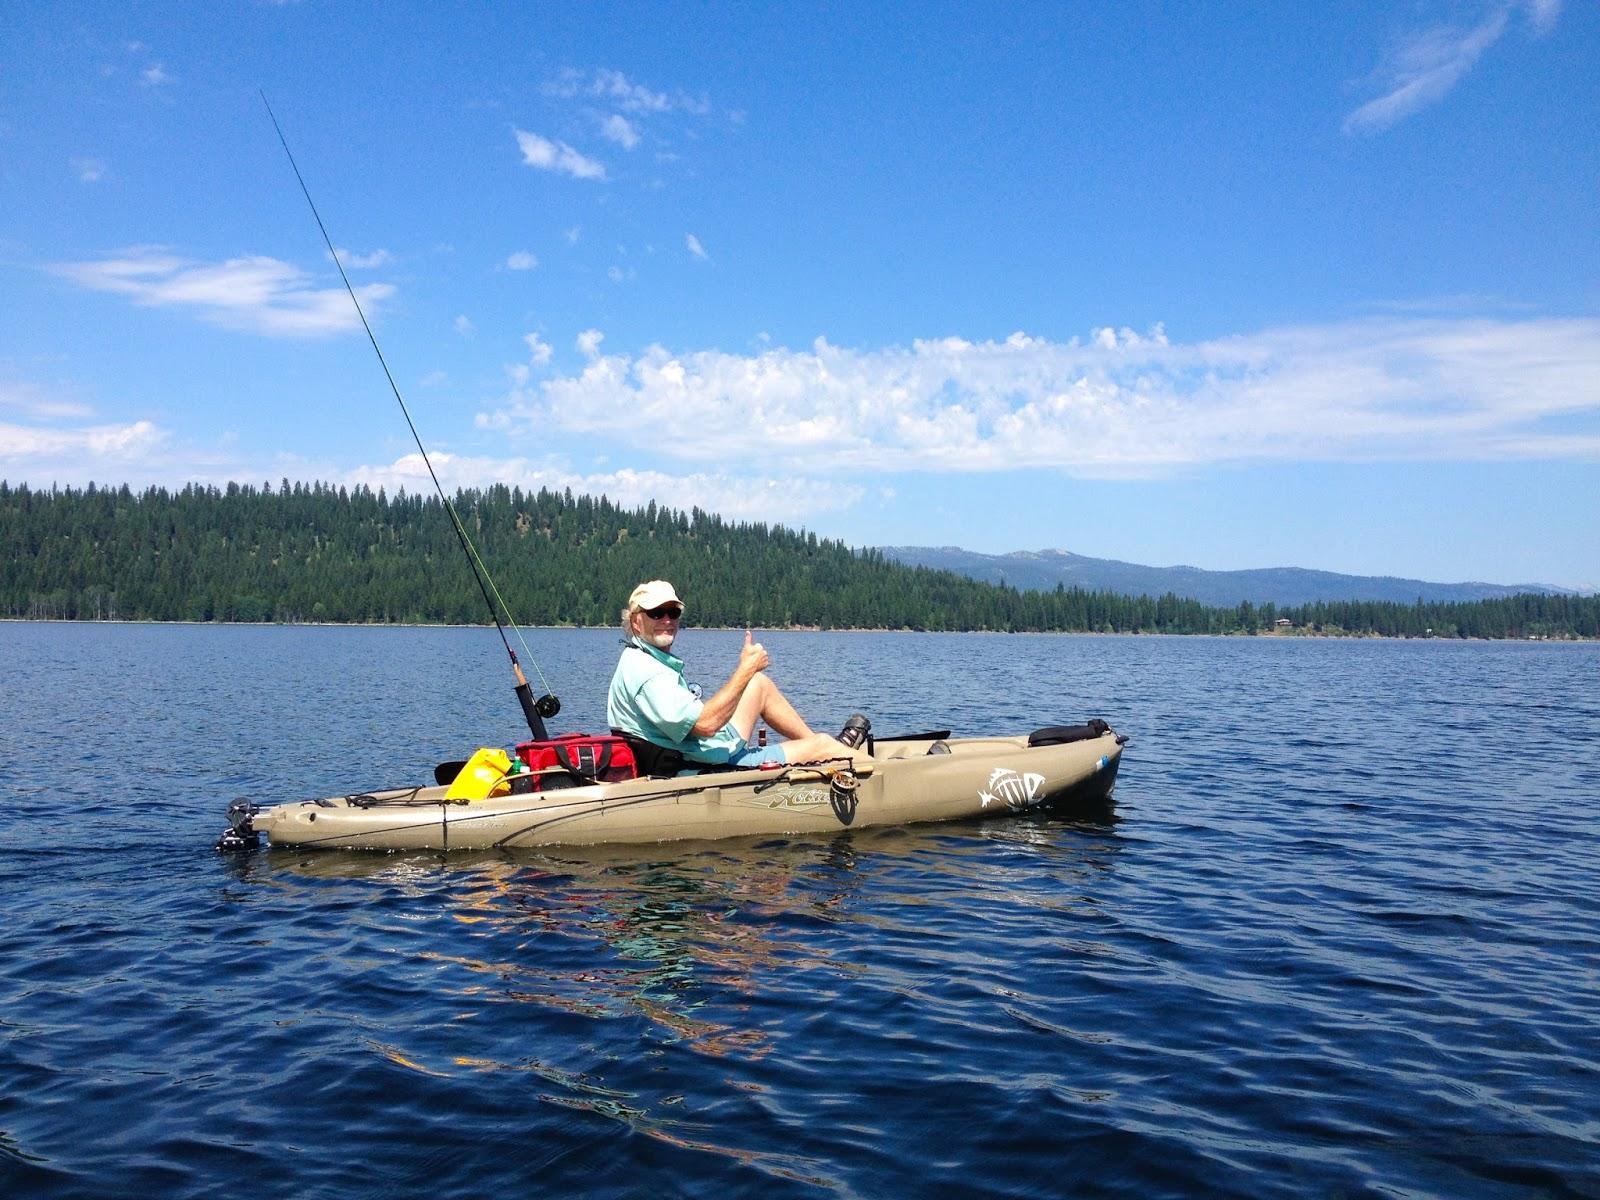 Erik s fly fishing blog thank you trash fish for Fly fishing blogs